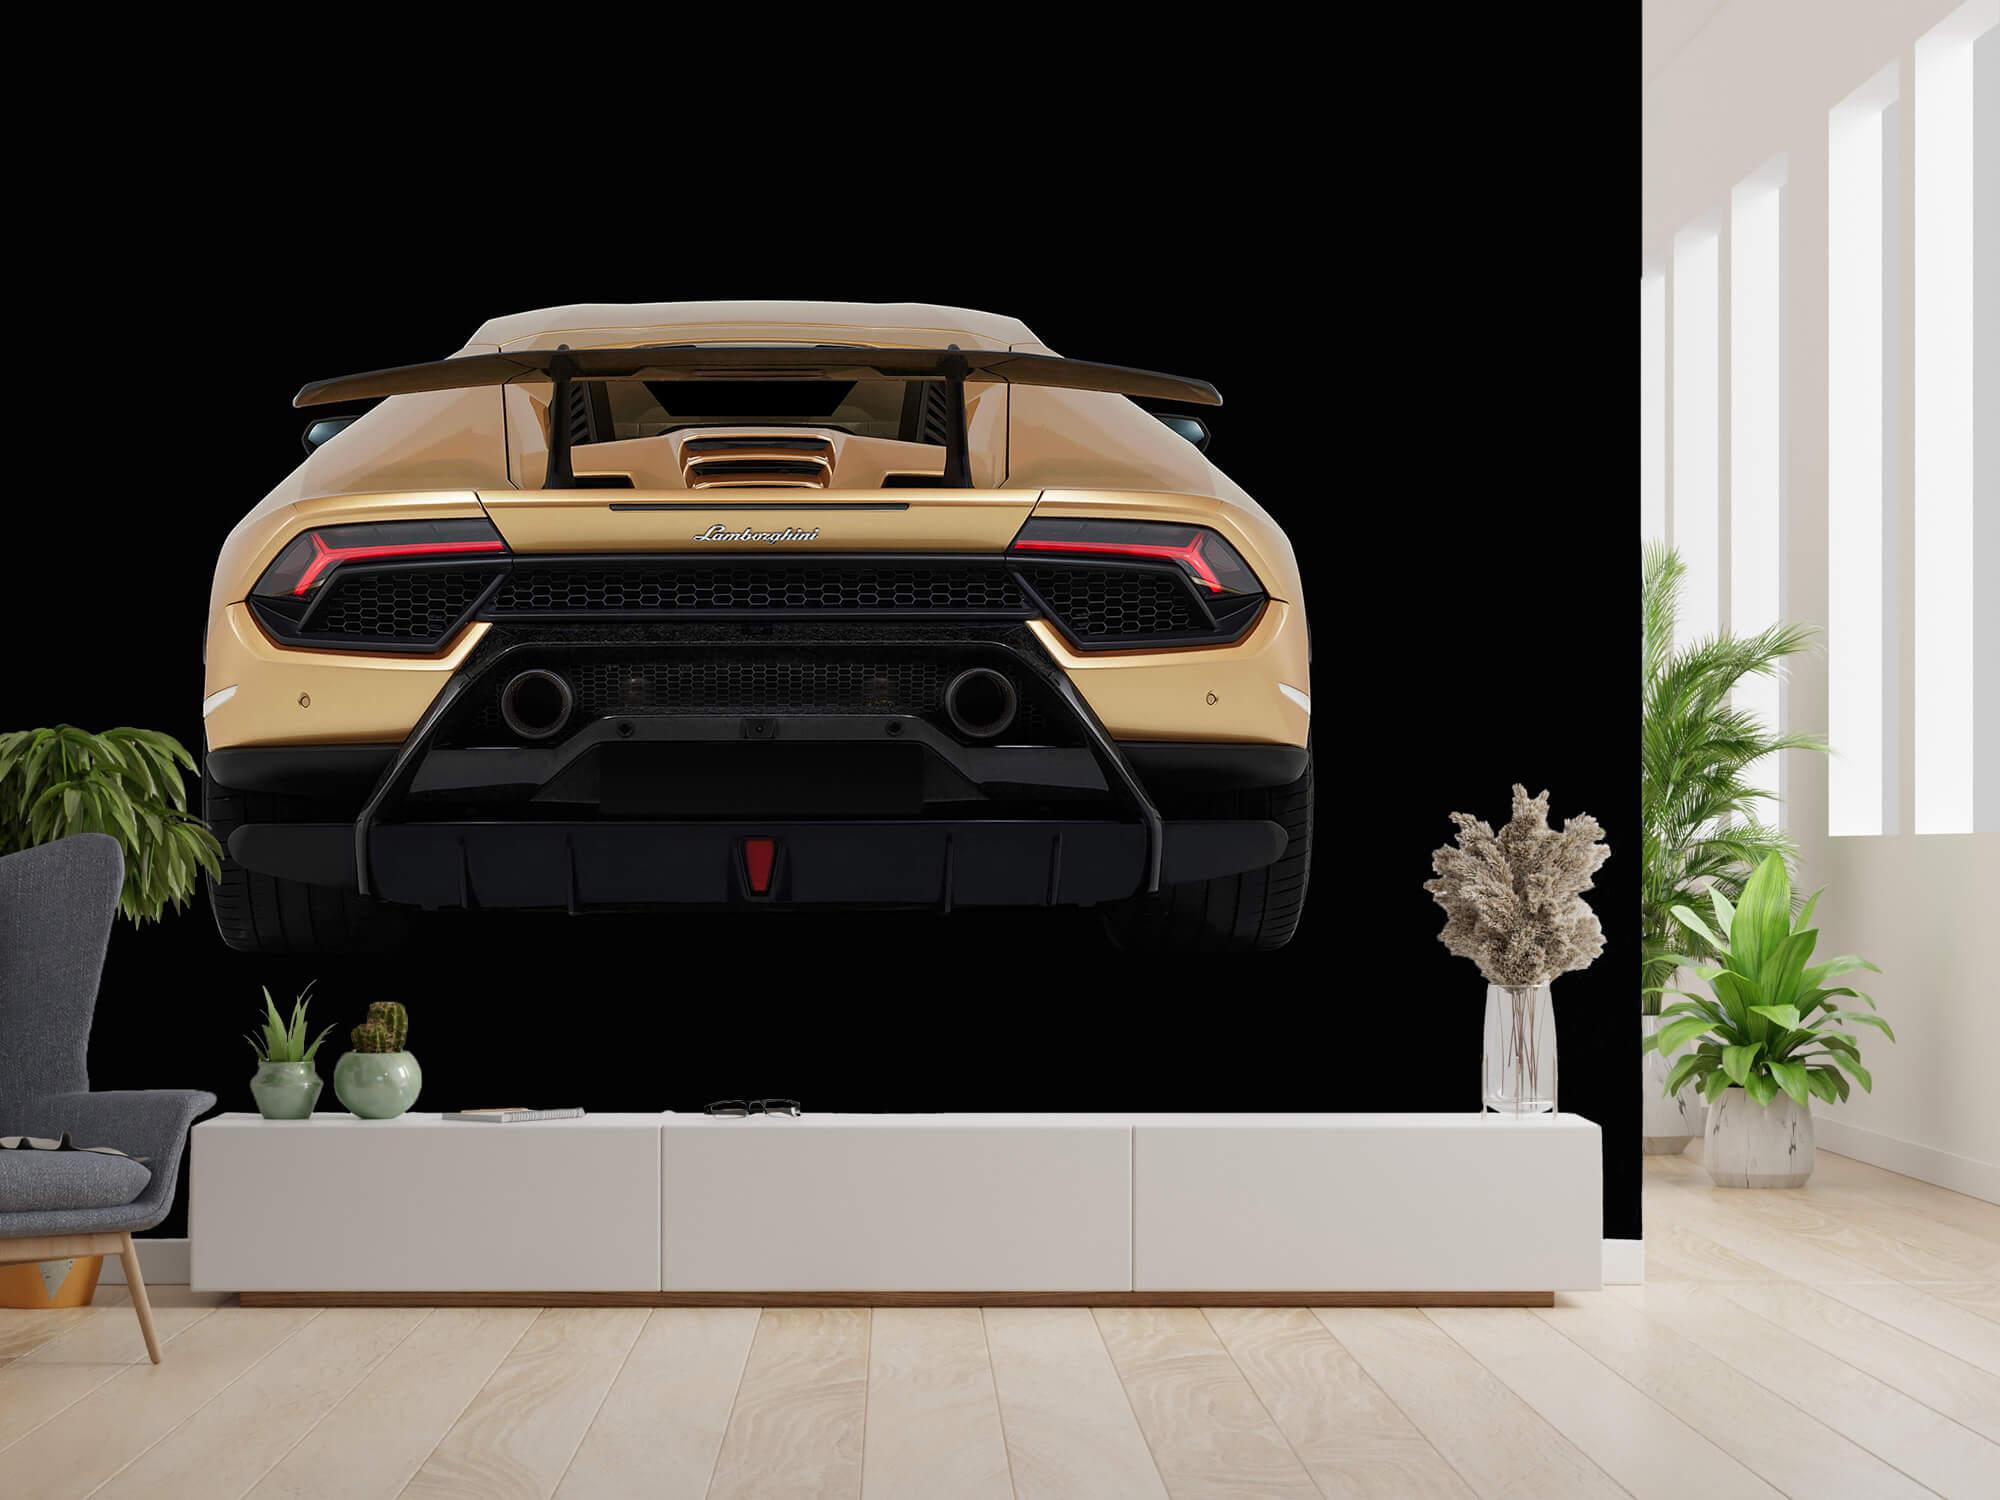 Wallpaper Lamborghini Huracán - Achterkant, zwart 2